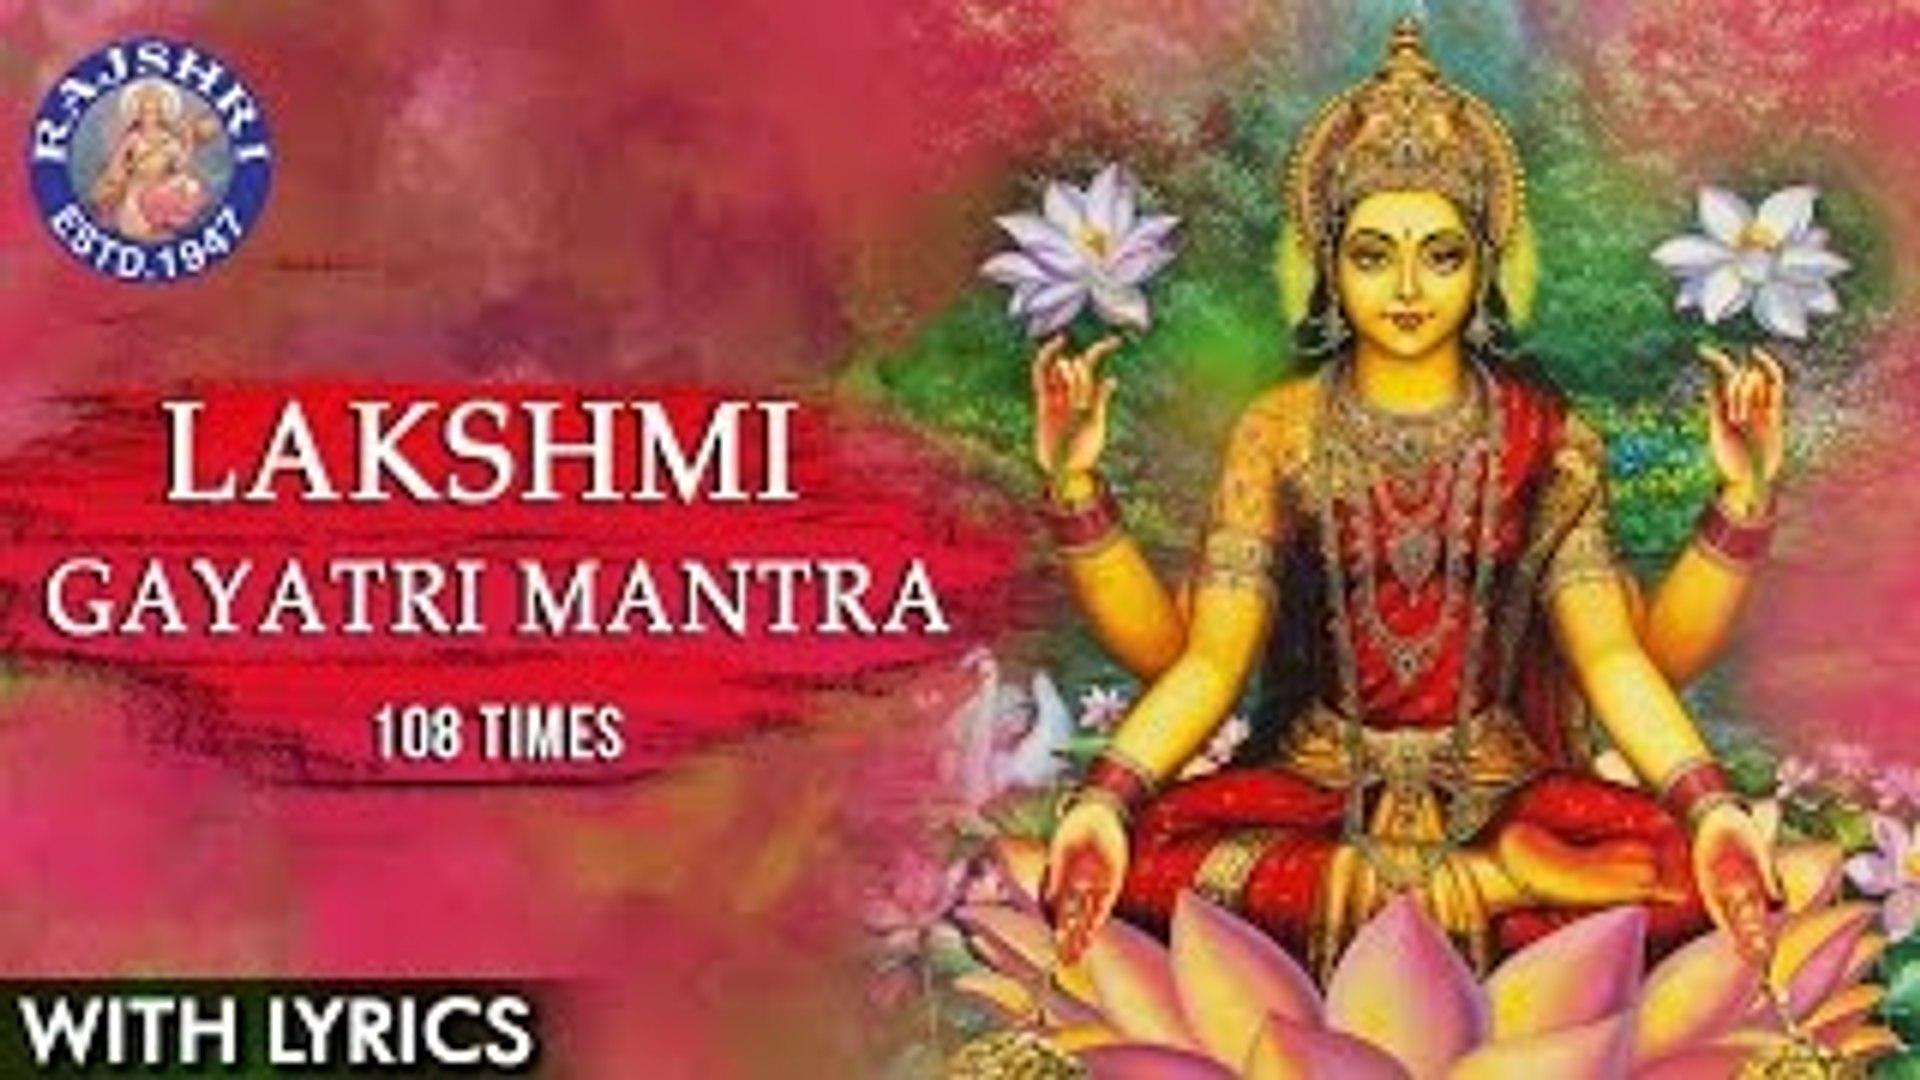 Sri Lakshmi Gayatri Mantra 108 Times | Powerful Mantra For Money & Wealth |  Diwali Special 2016